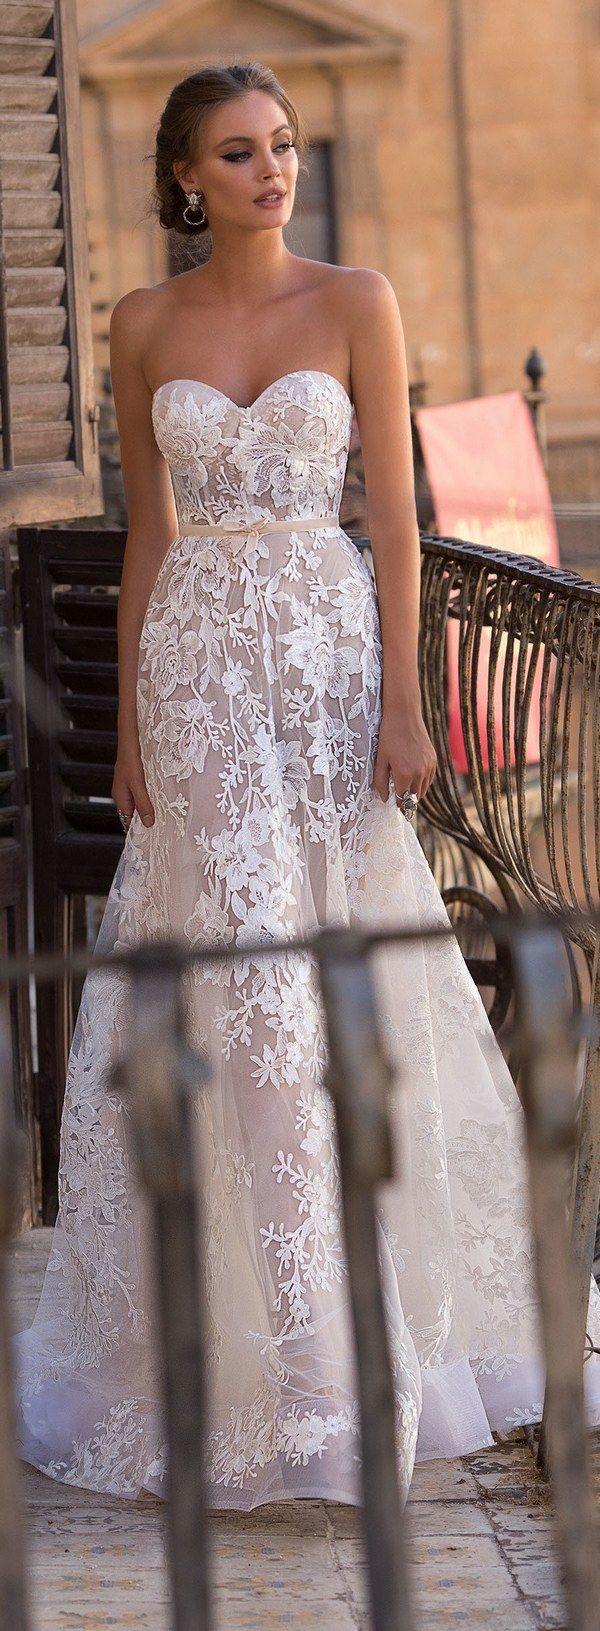 Royal themed wedding dresses  Shaylah Hansen shaylahh on Pinterest